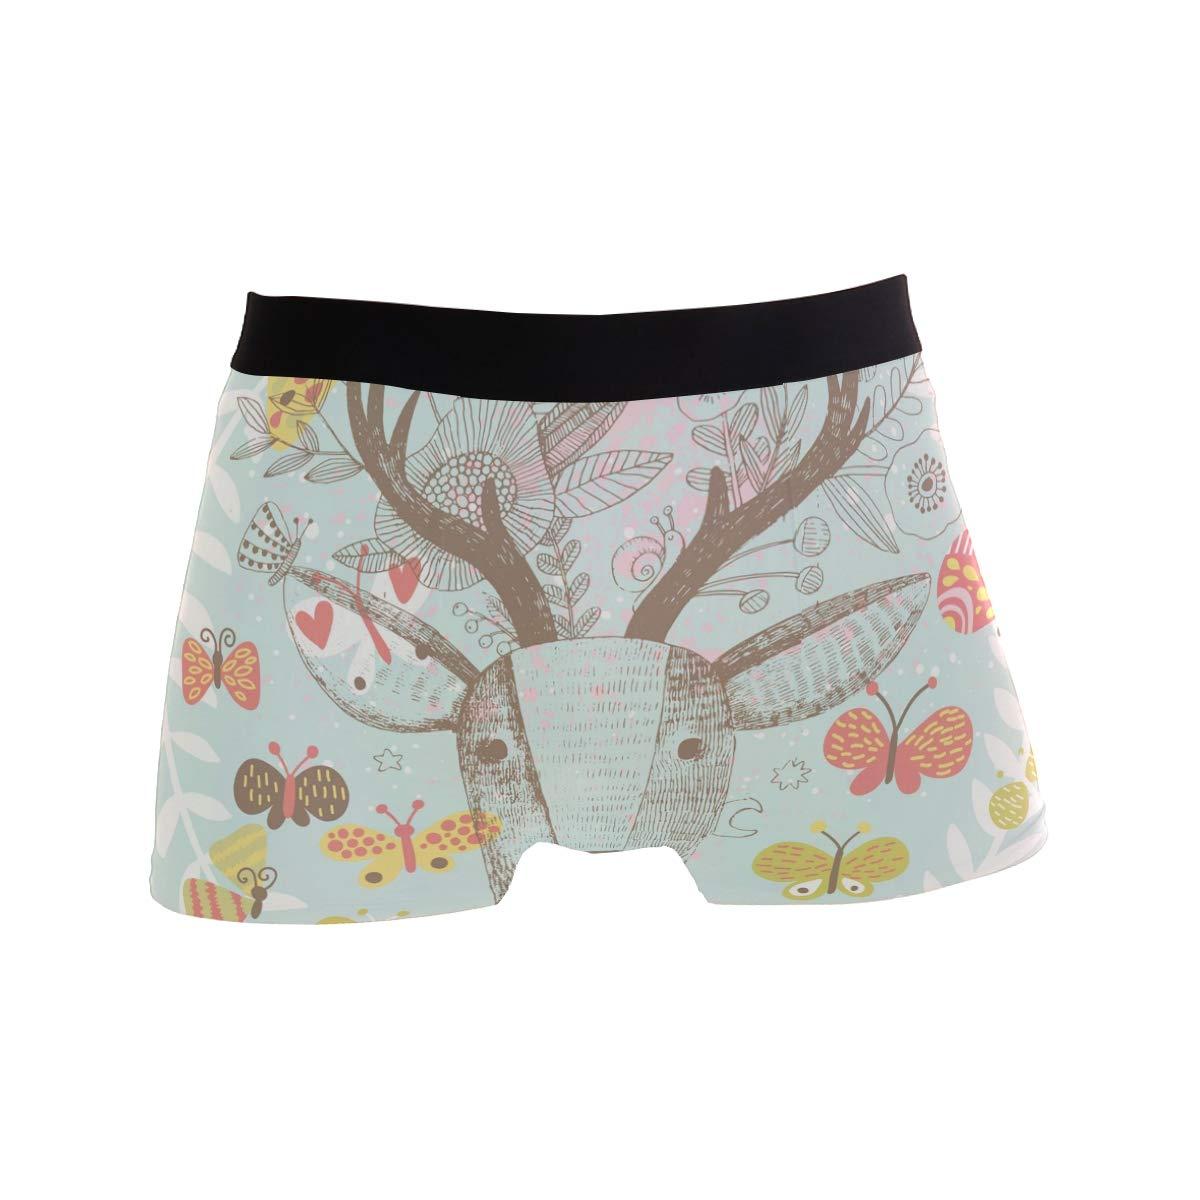 Spring Elk Deer with Flowers Butterfly Mens Underwear Soft Polyester Boxer Brief for Men Adult Teen Children Kids